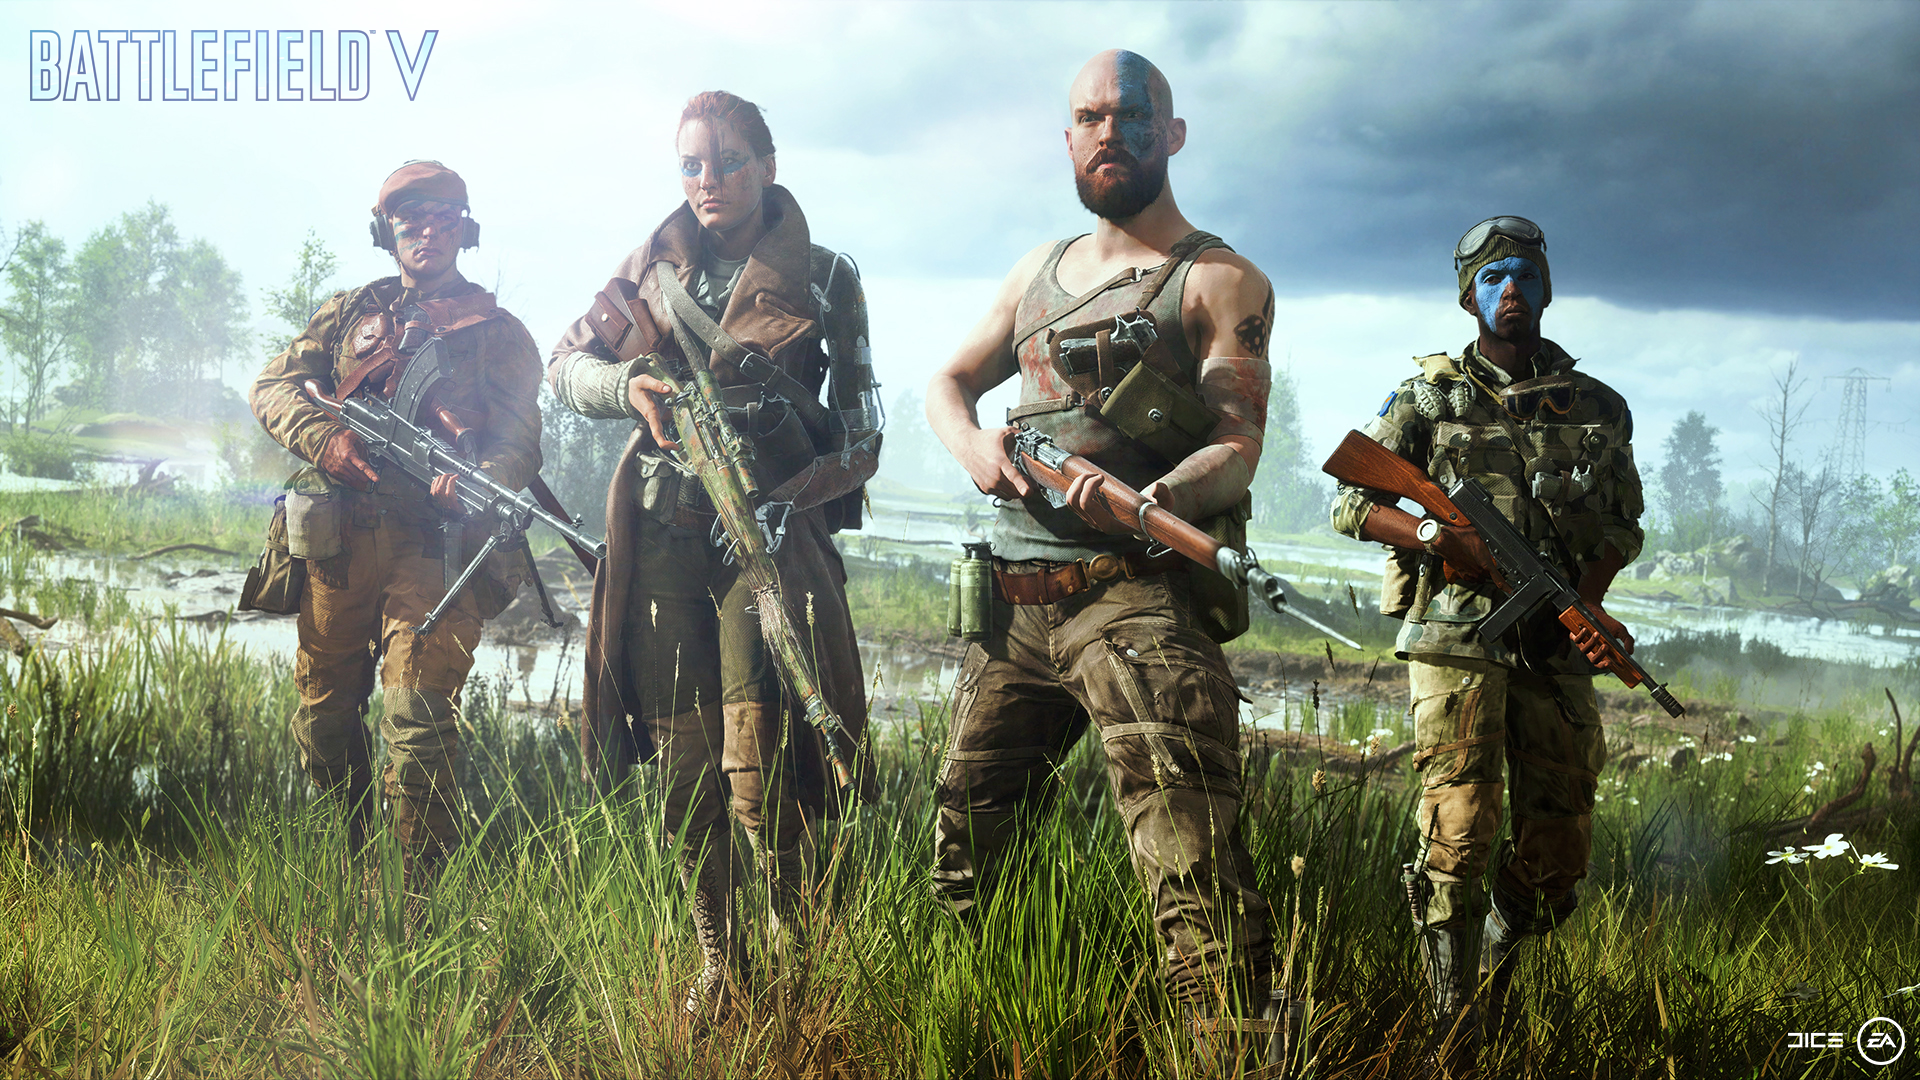 Battlefield 5 update 111